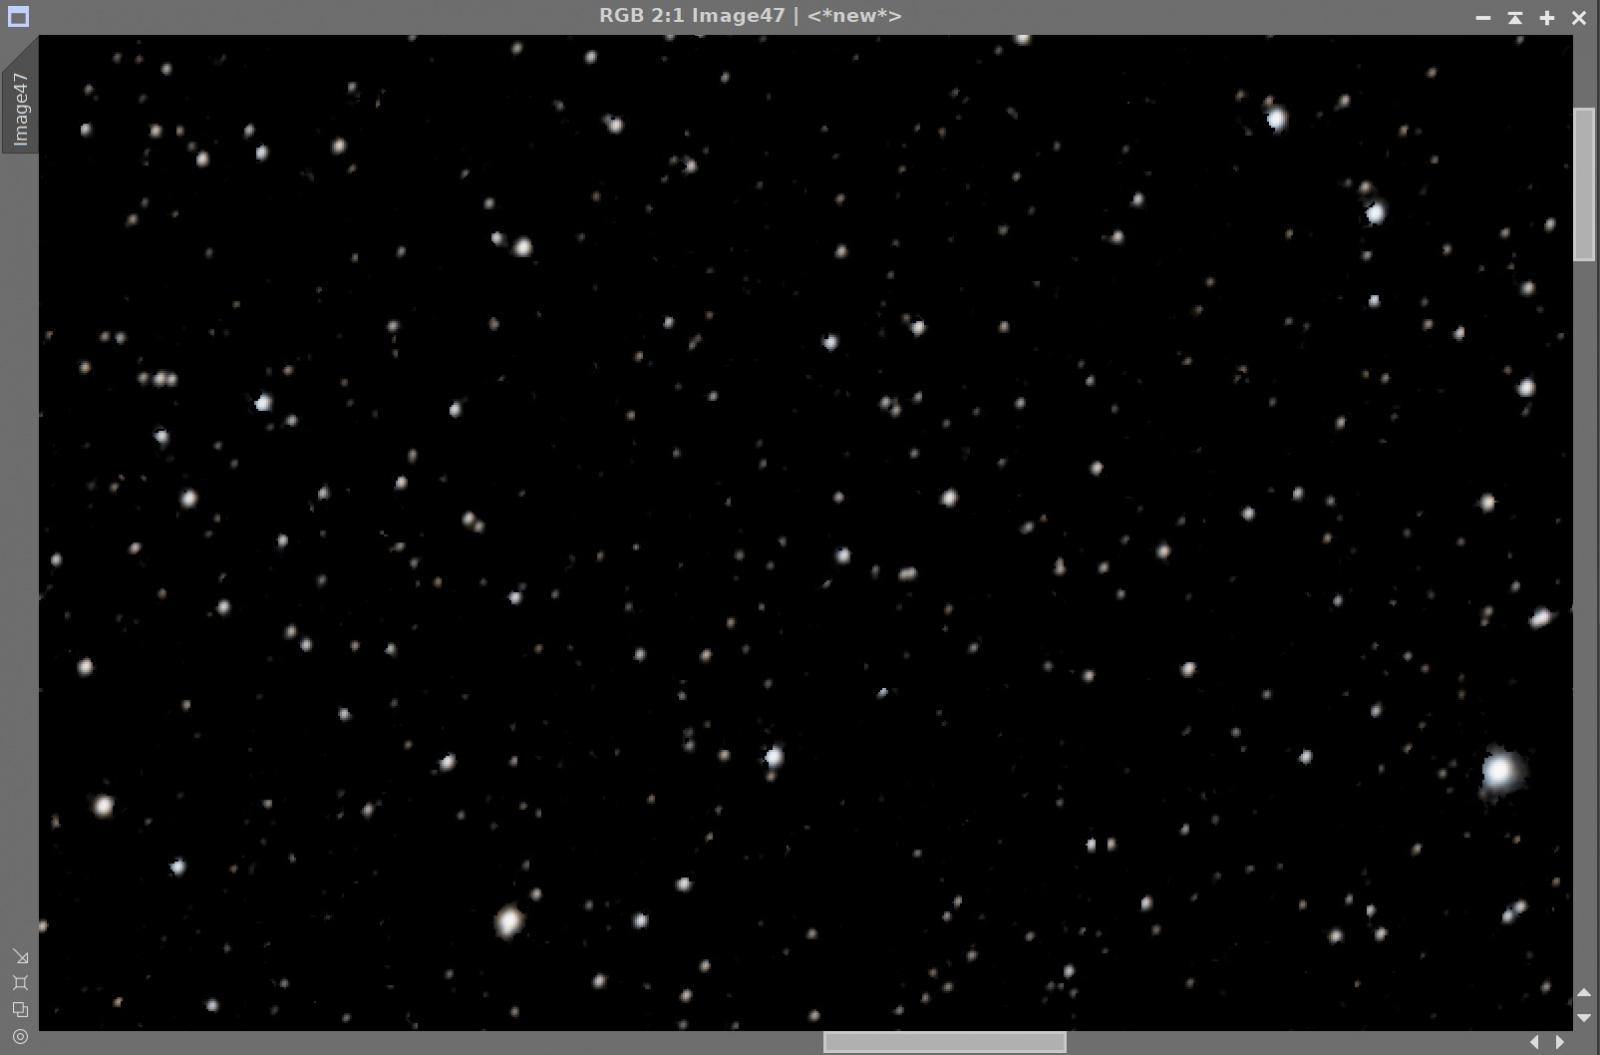 pix_without_colors.thumb.jpg.61eb436a6e3e2184e9c957e3eb345935.jpg